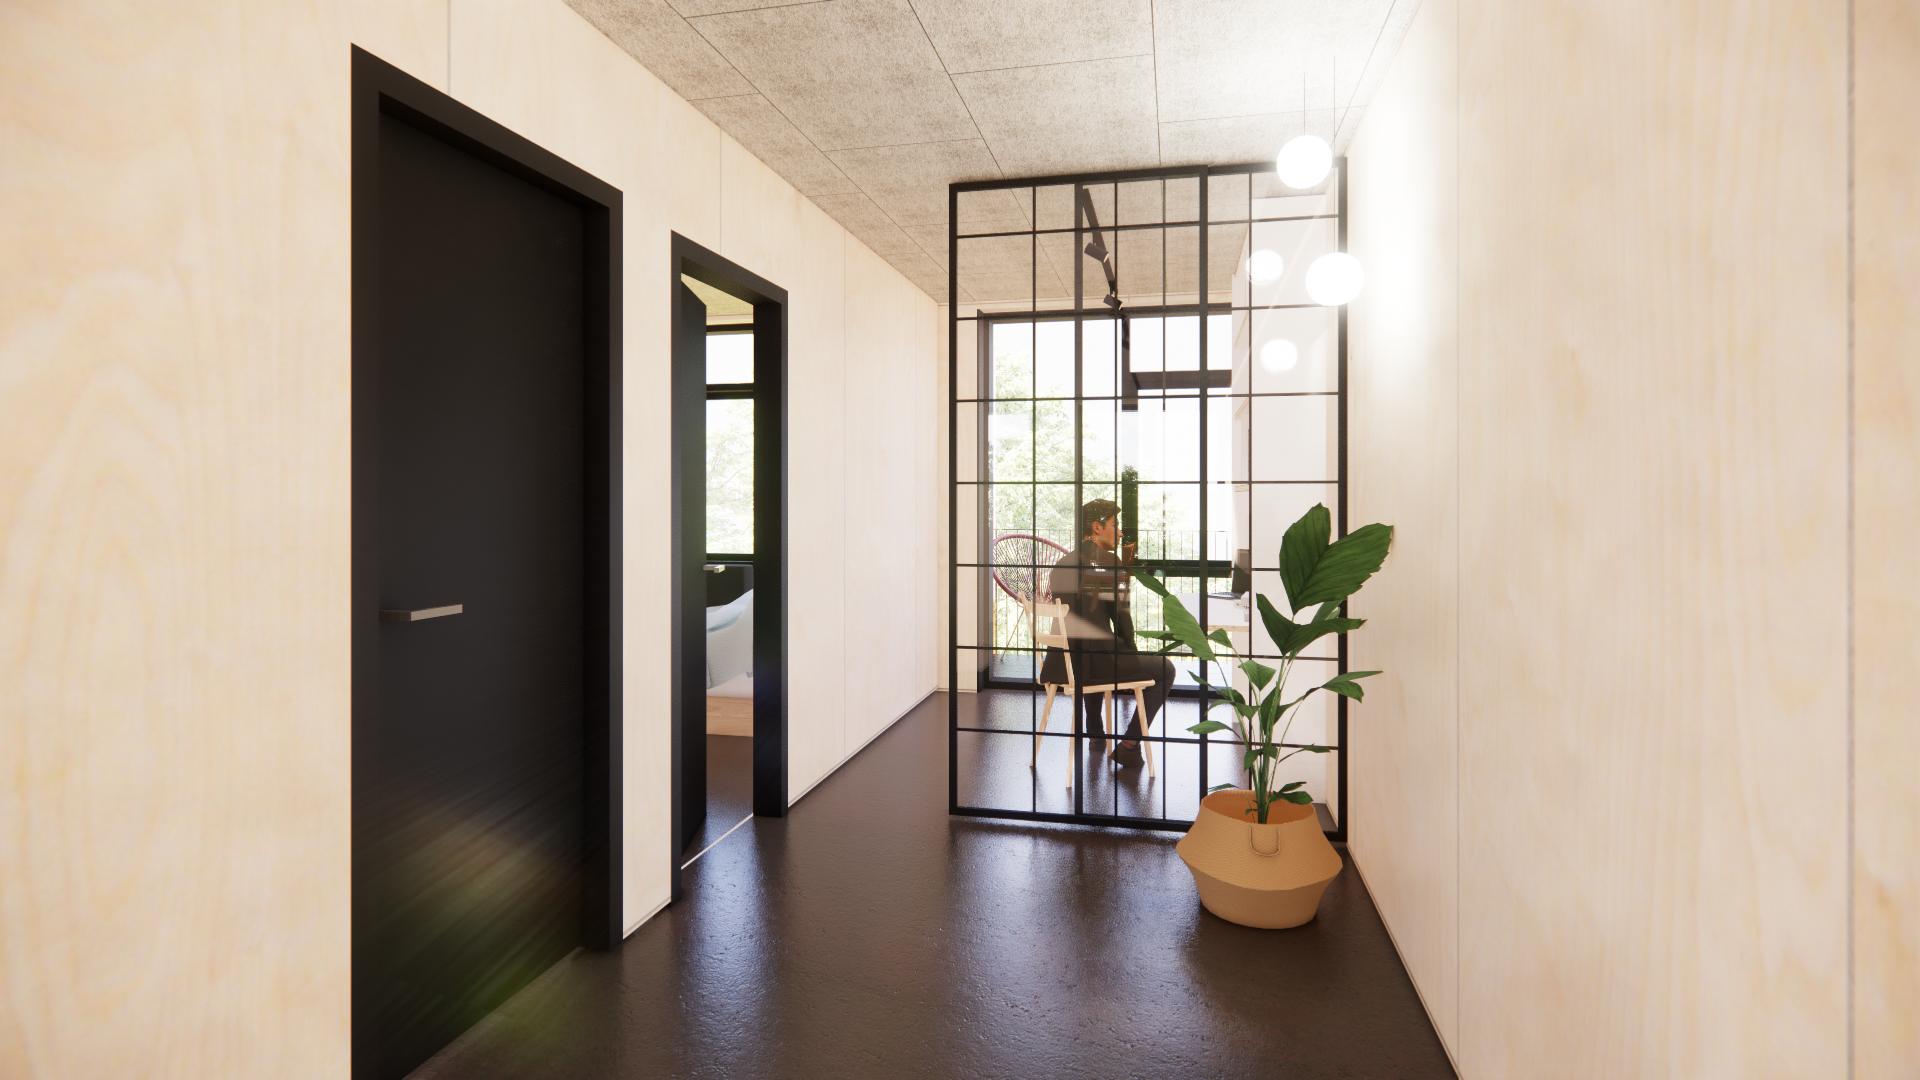 Visualisering værelse 60 m2 lejlighed Musicon | Container Living